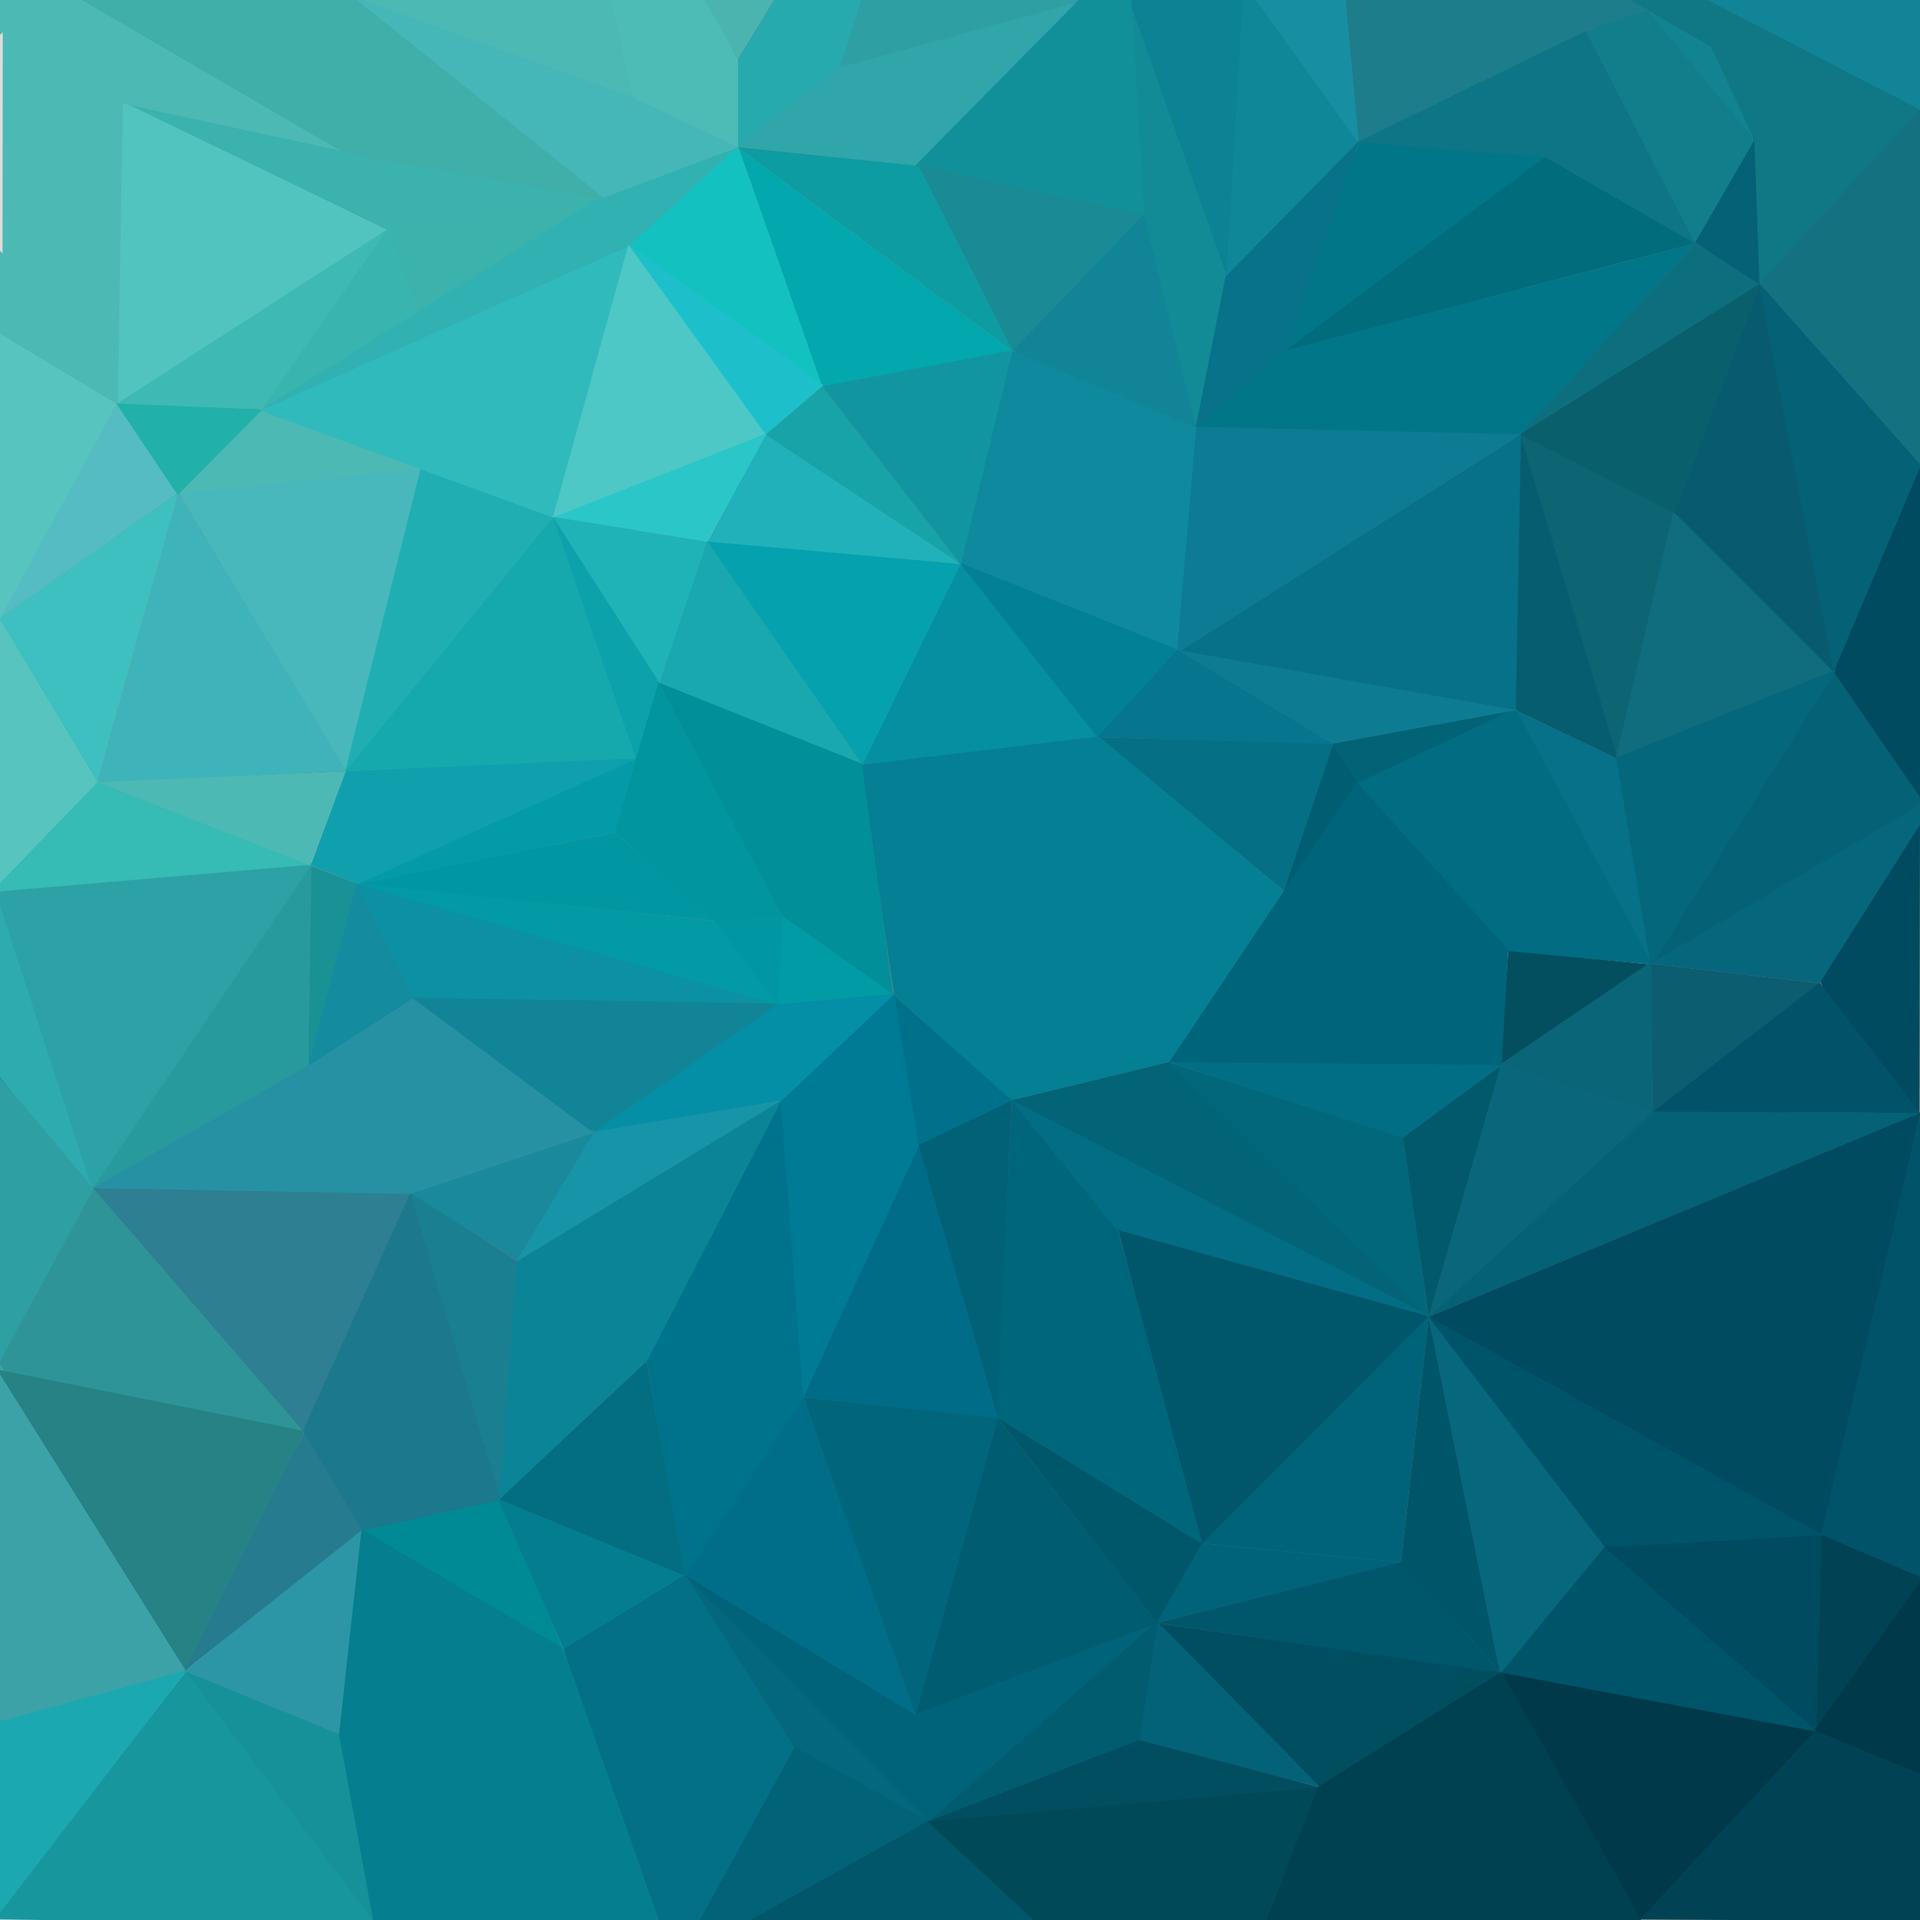 Galaxy S5 Default Wallpaper